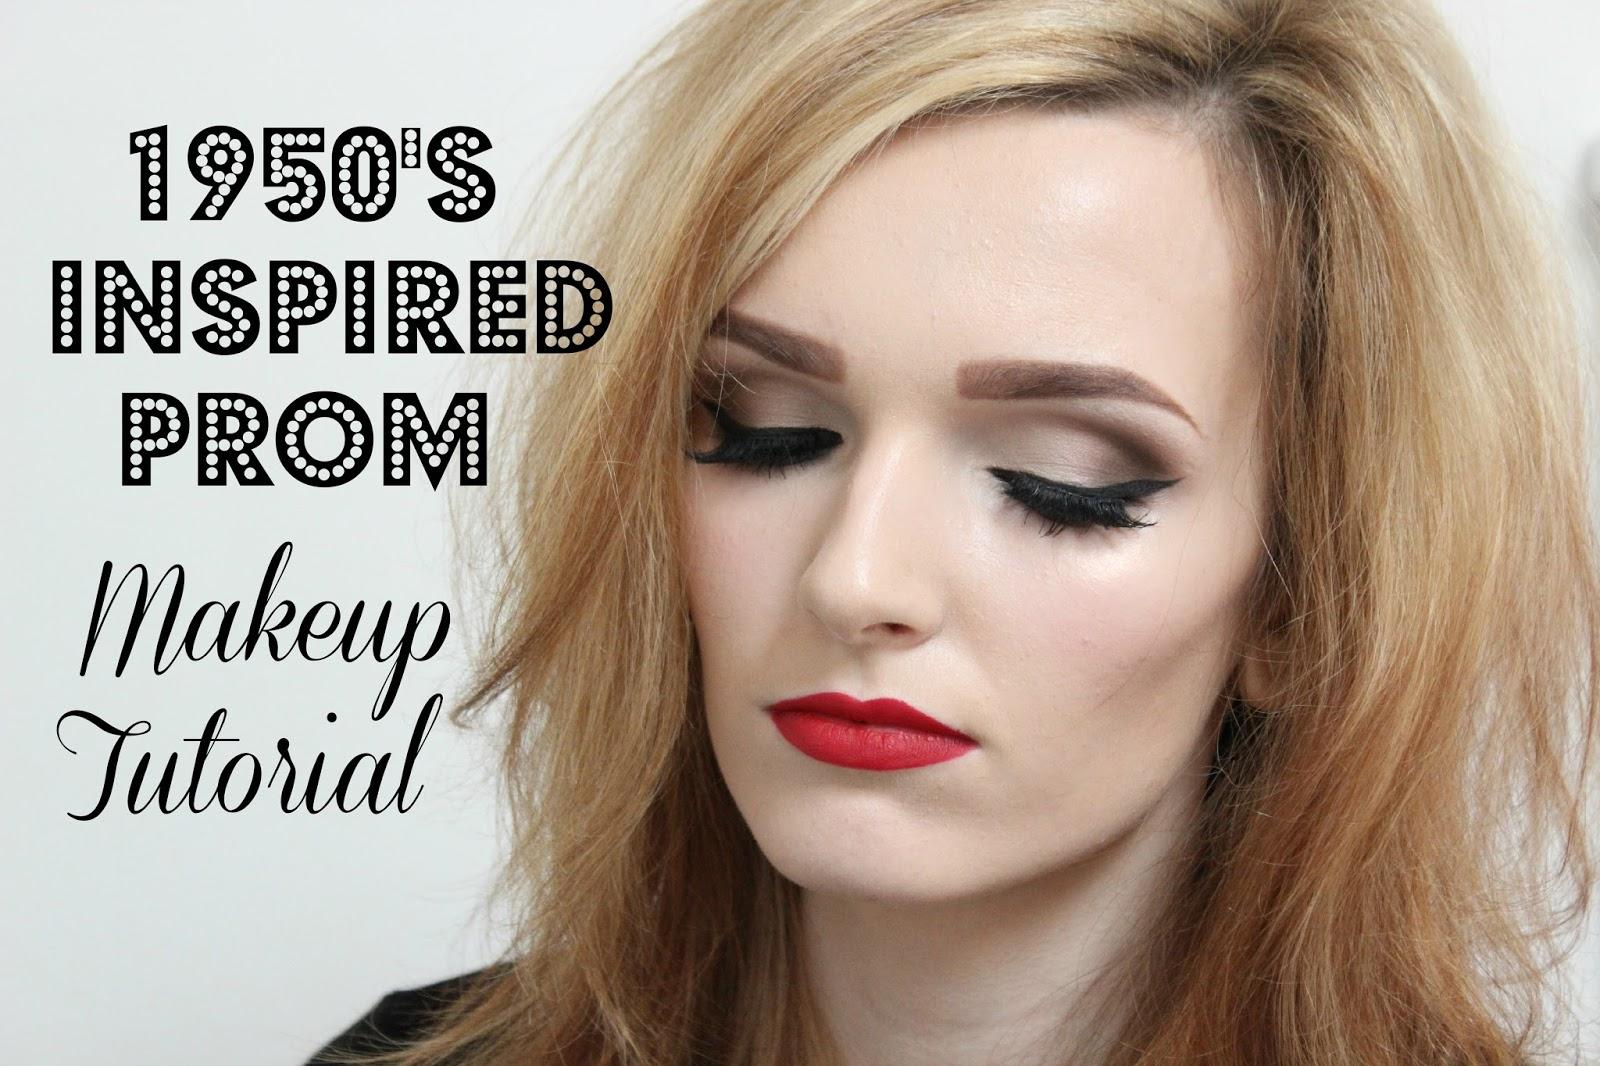 Coleyyyful: A Beauty & Fashion Blog: 1950's Inspired Prom ...  Coleyyyful: A B...